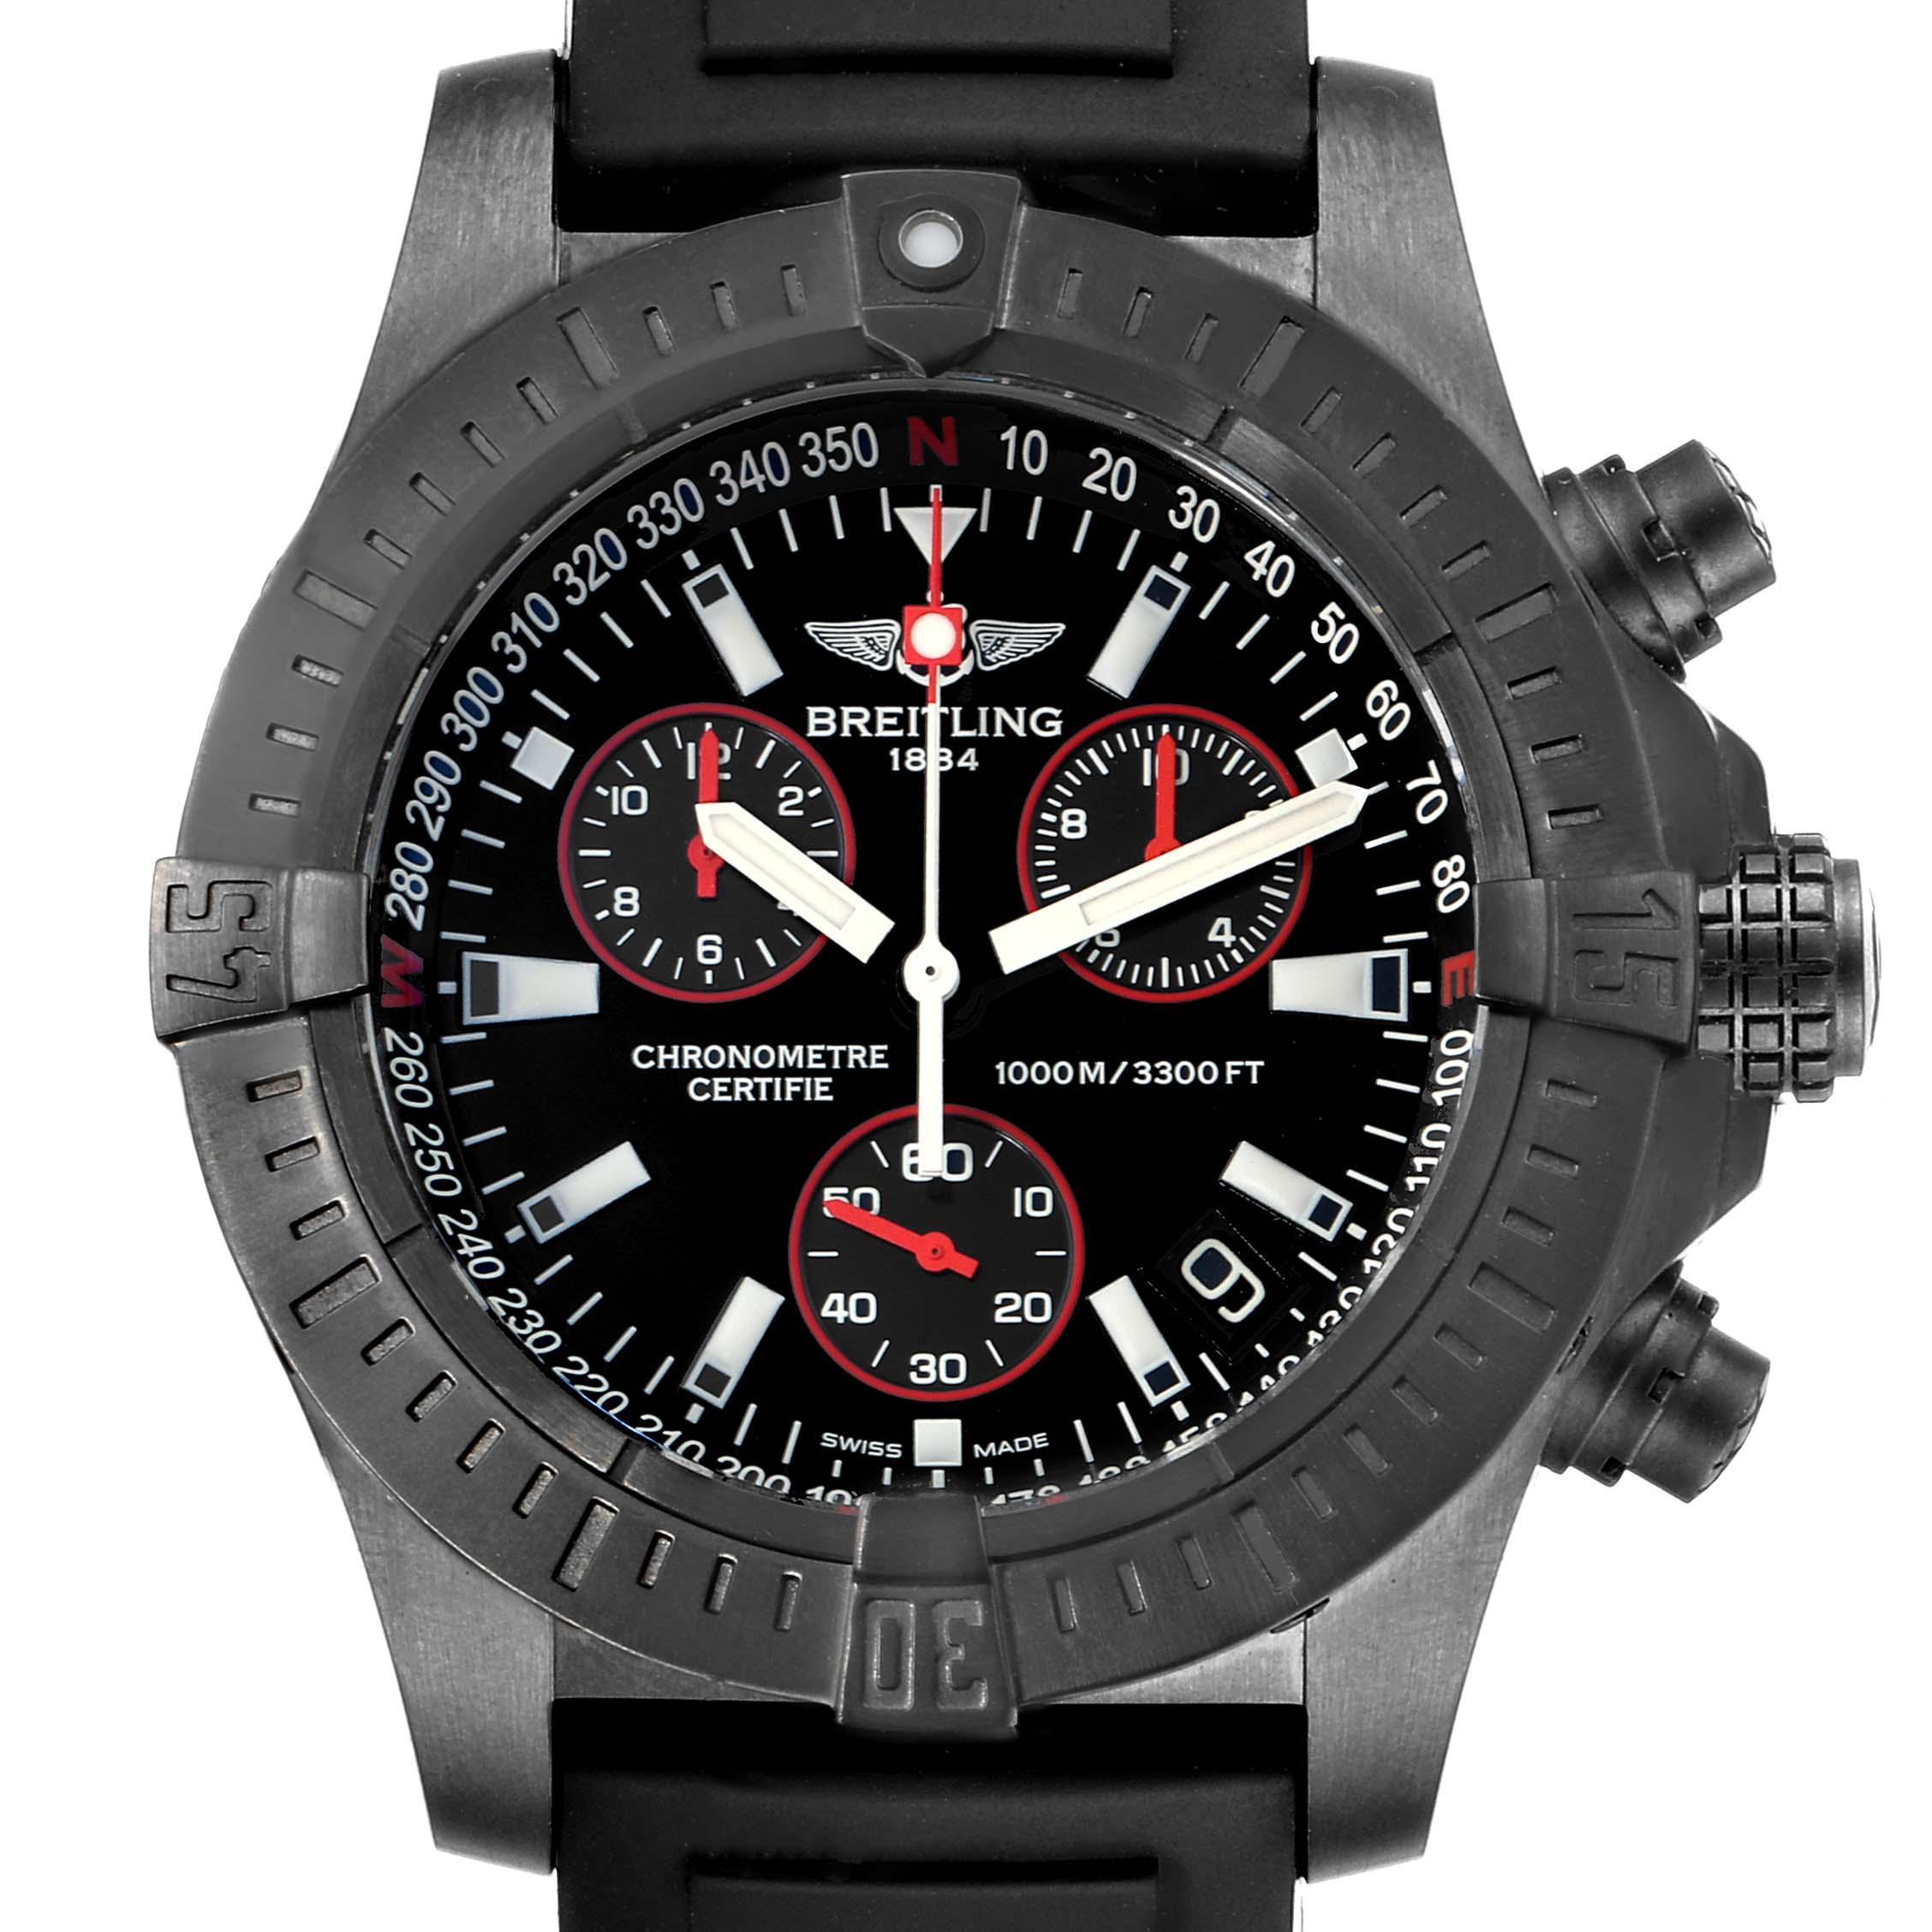 Breitling Aeromarine Avenger Seawolf Blacksteel Watch M73390 Box Papers SwissWatchExpo